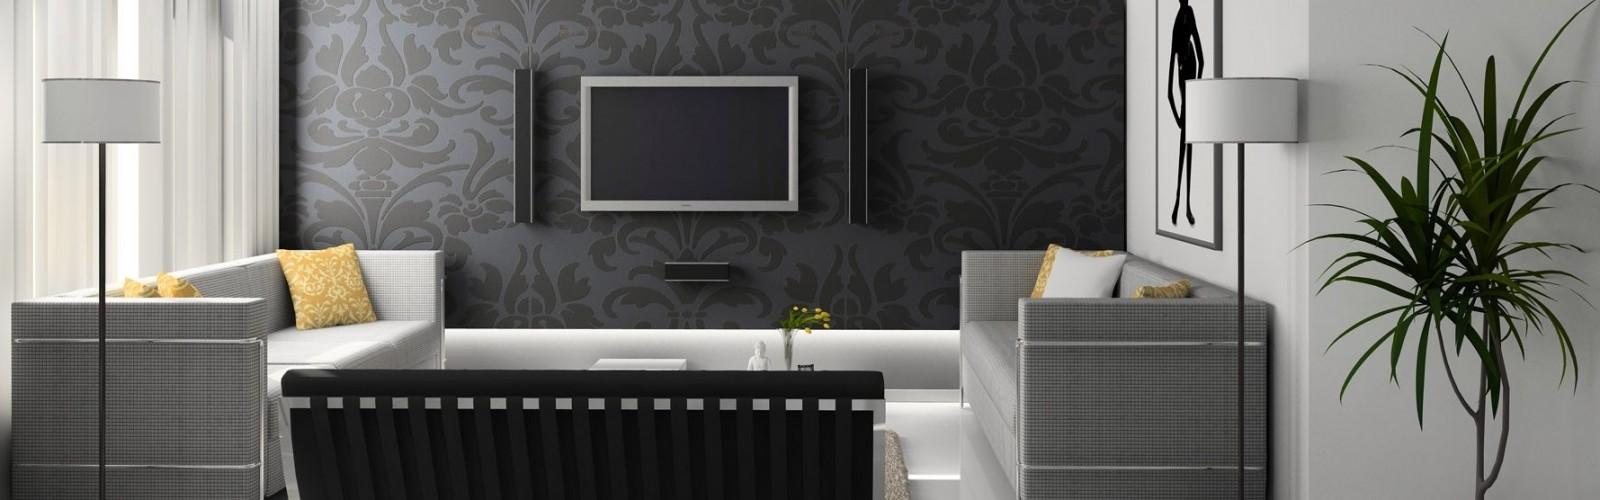 livingroom-1032733